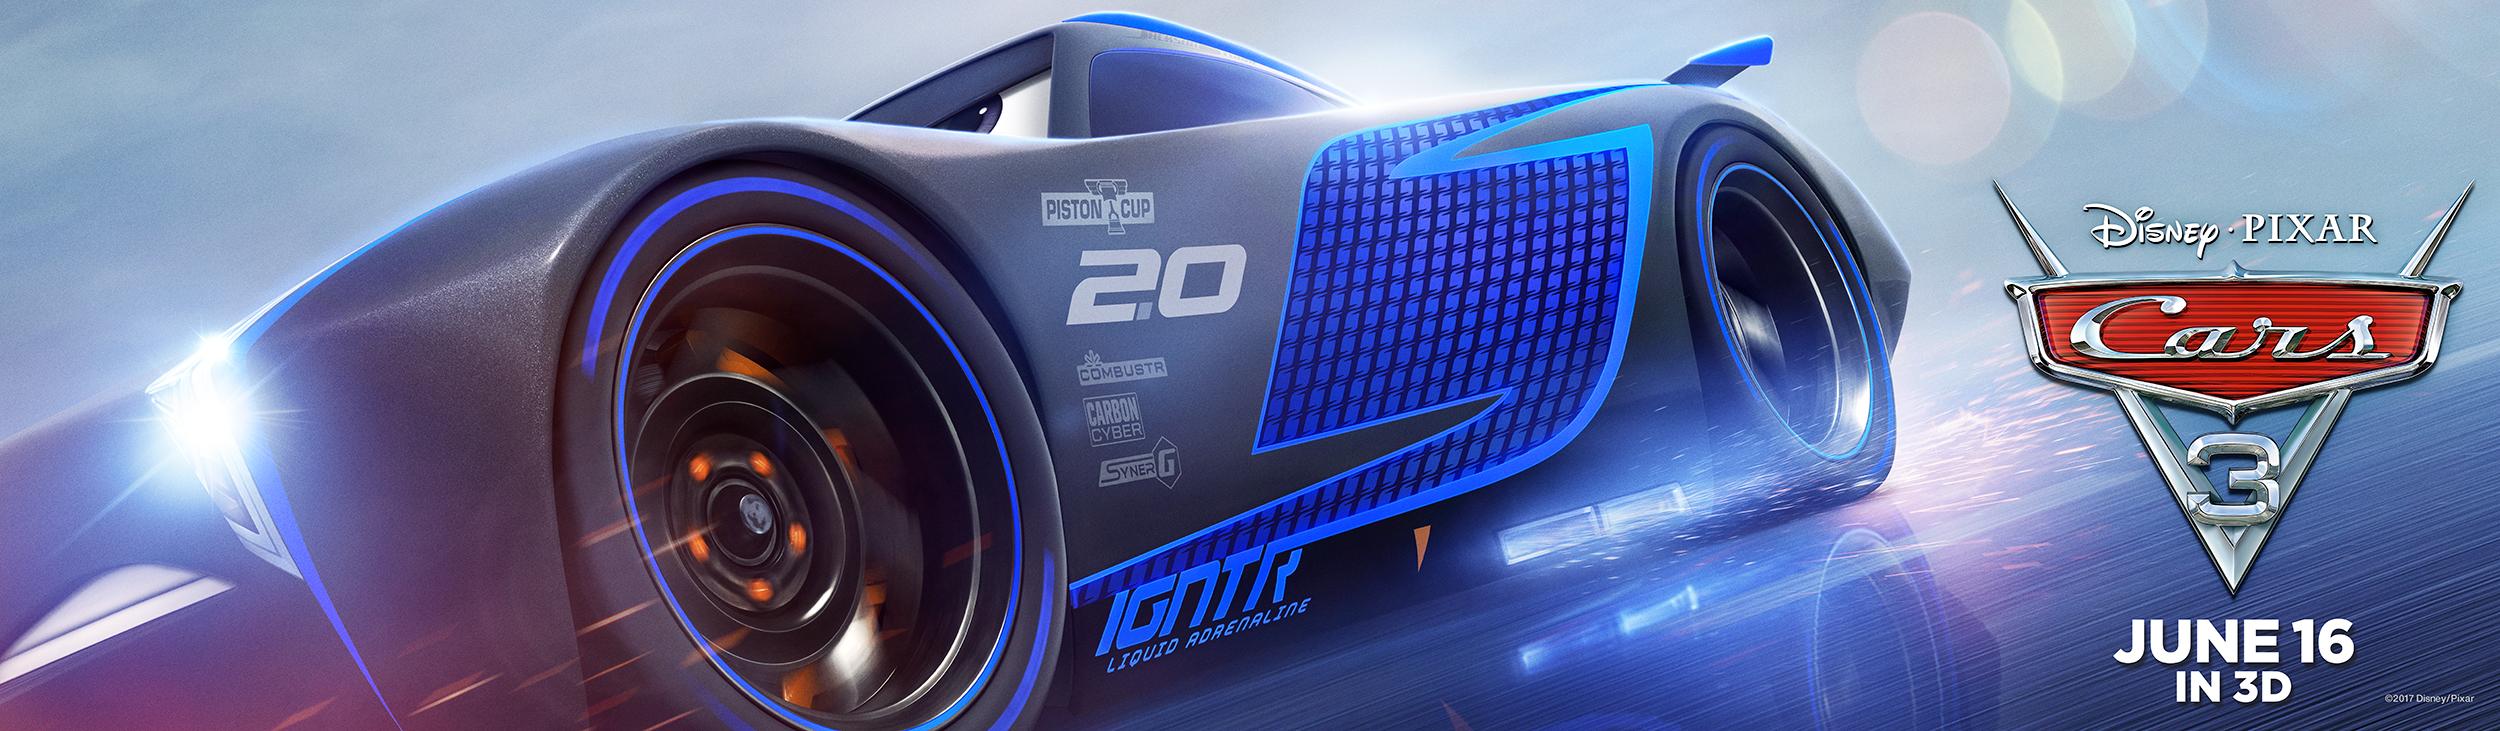 Cars 3 | Storm Billboard Concept, Finishing & Illustration